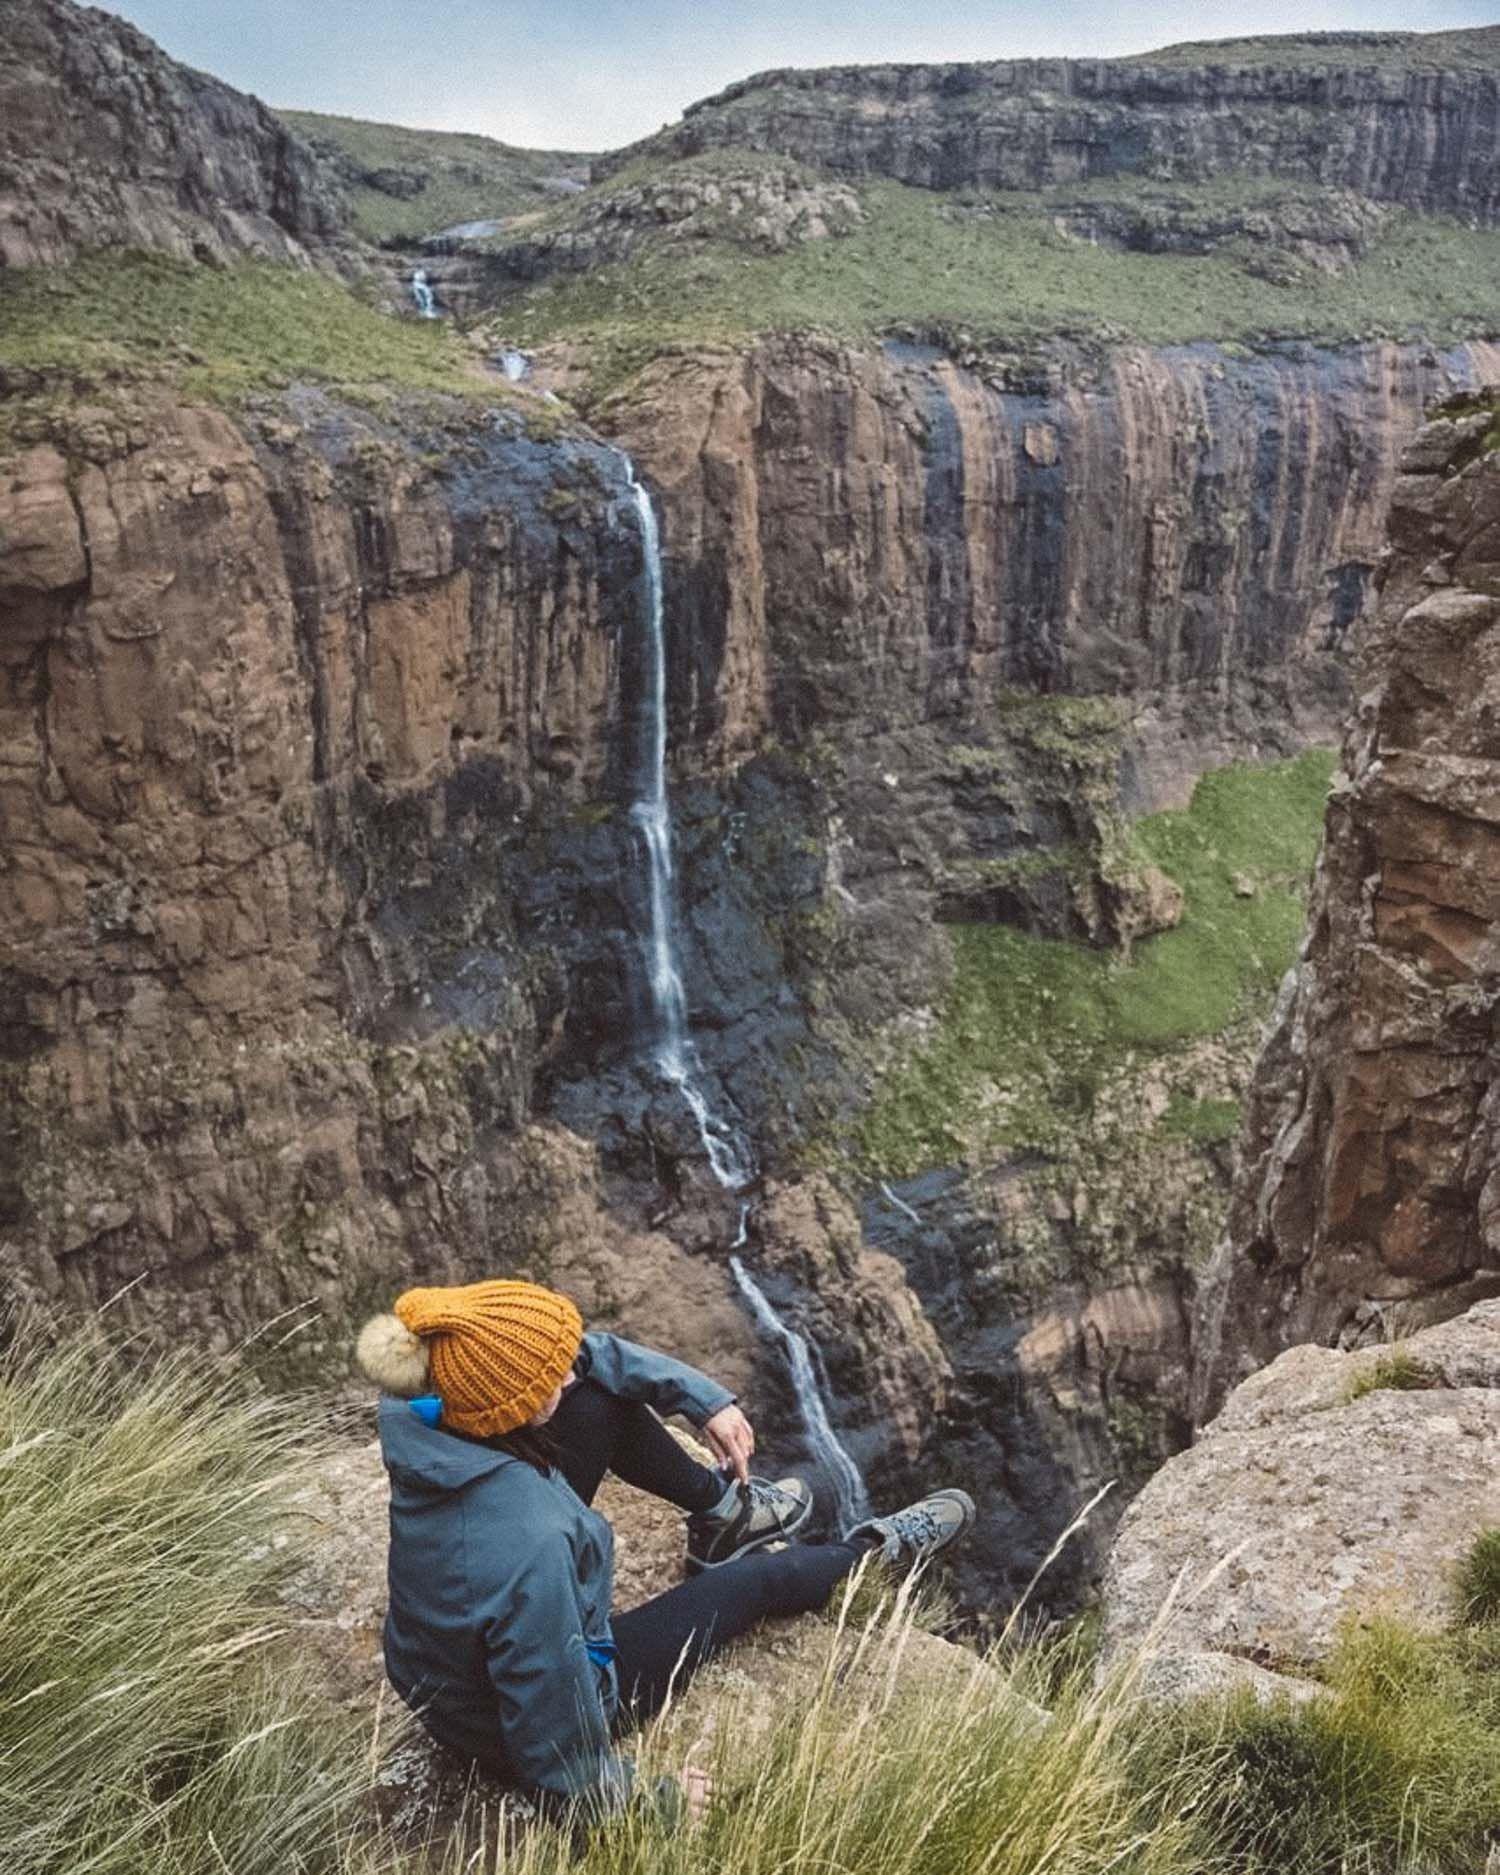 2. Tugela Falls